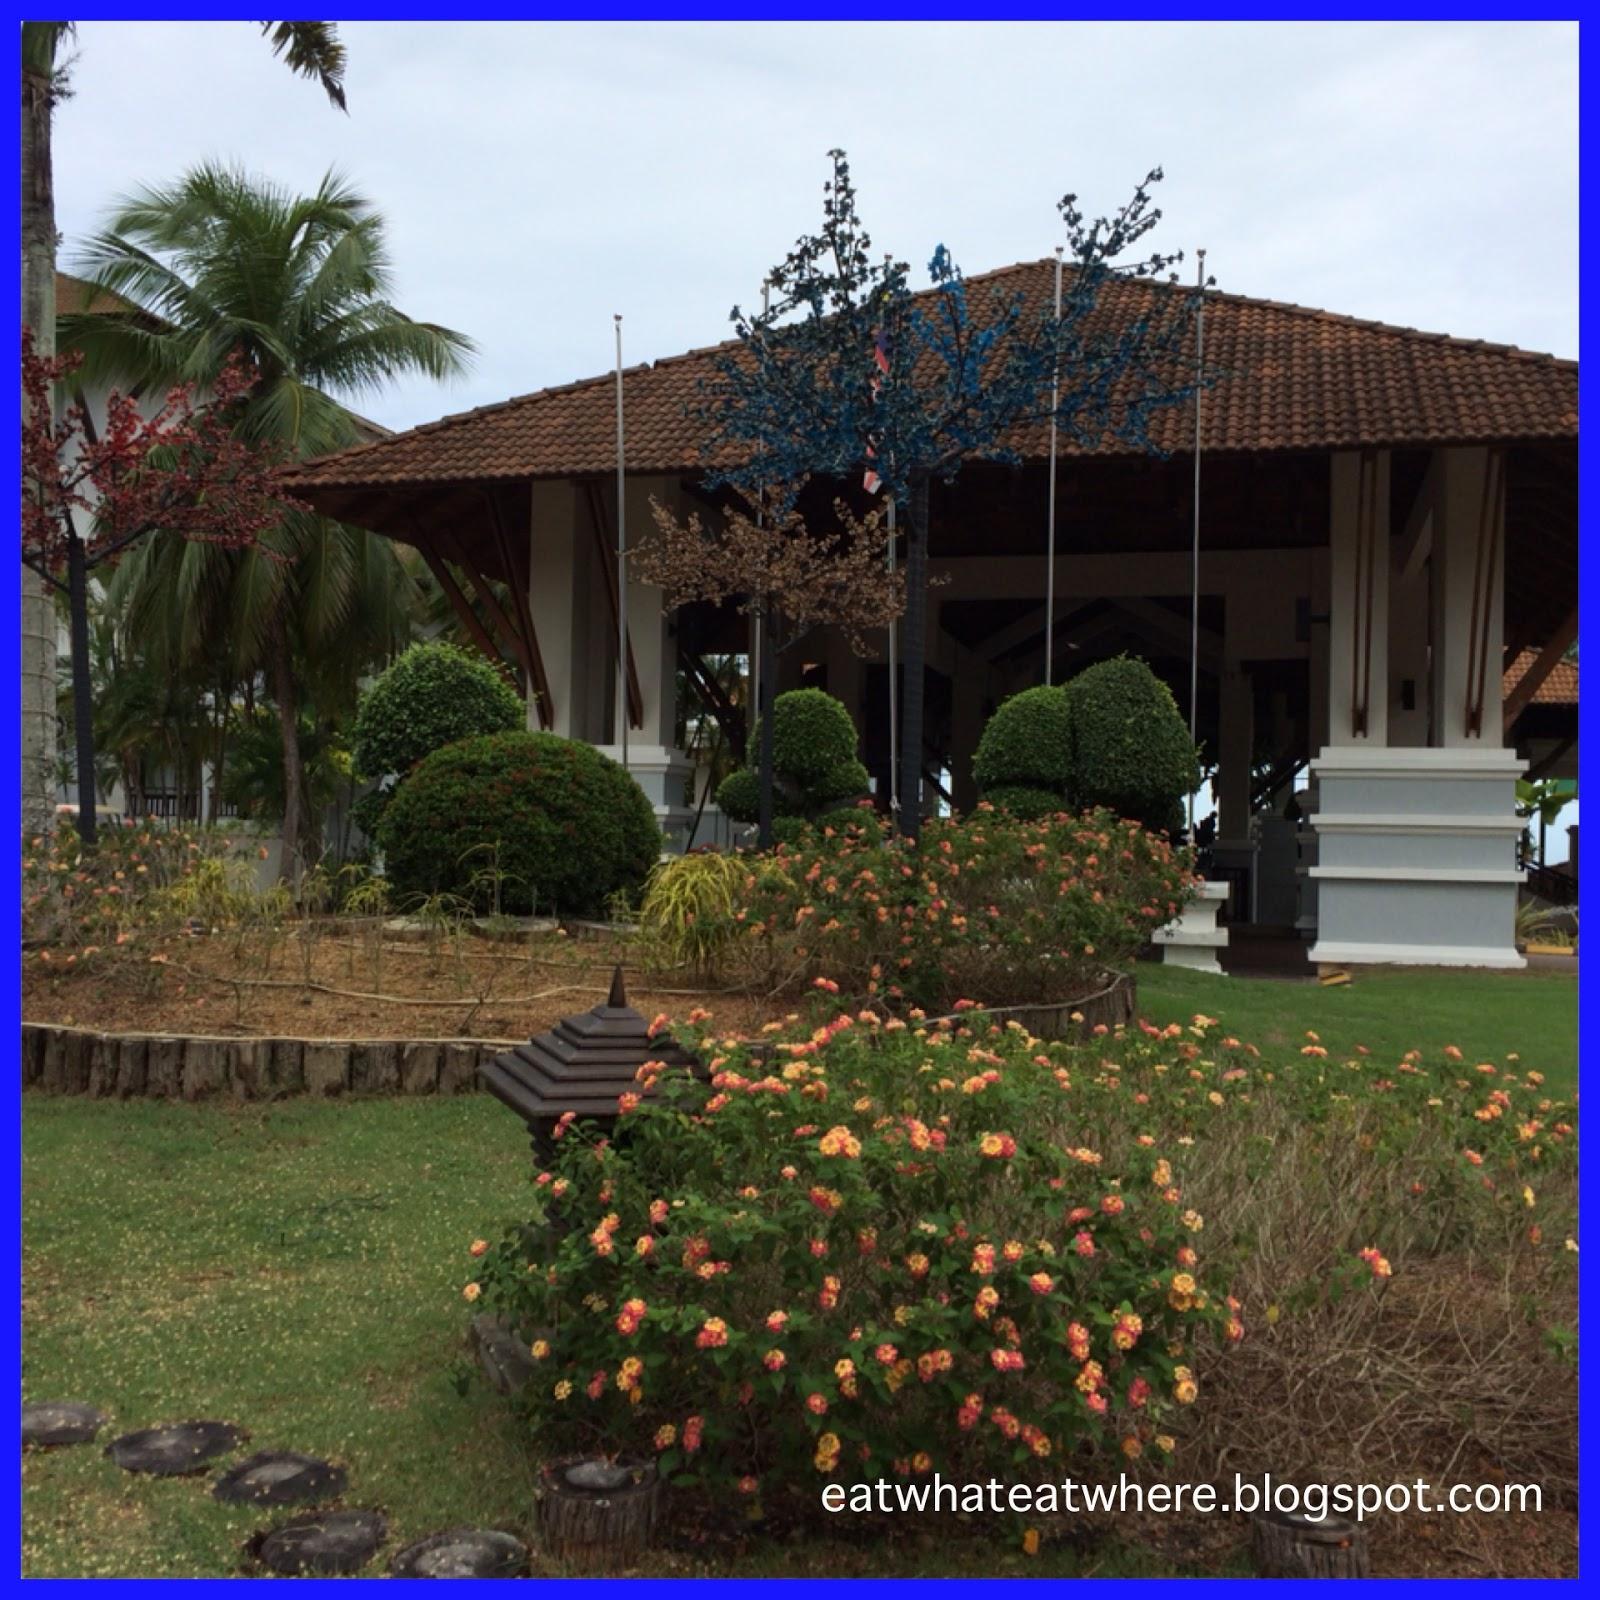 Eat what, Eat where?: Stay @ Swiss Garden Beach Resort Damai Laut, Lumut